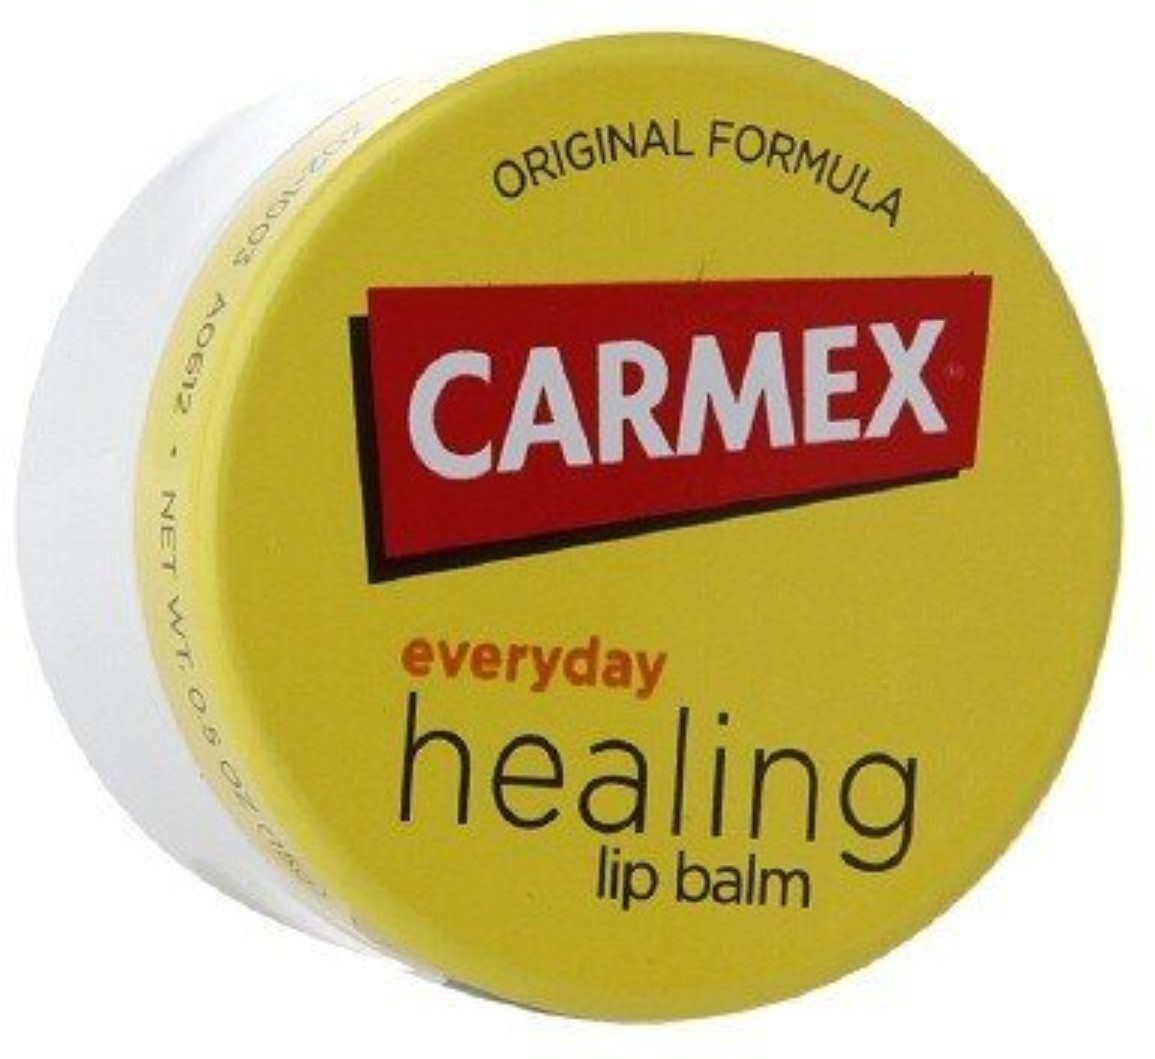 Carmex - Everyday Healing Lip Balm External Analgesic Original Formula - 0.5 oz.